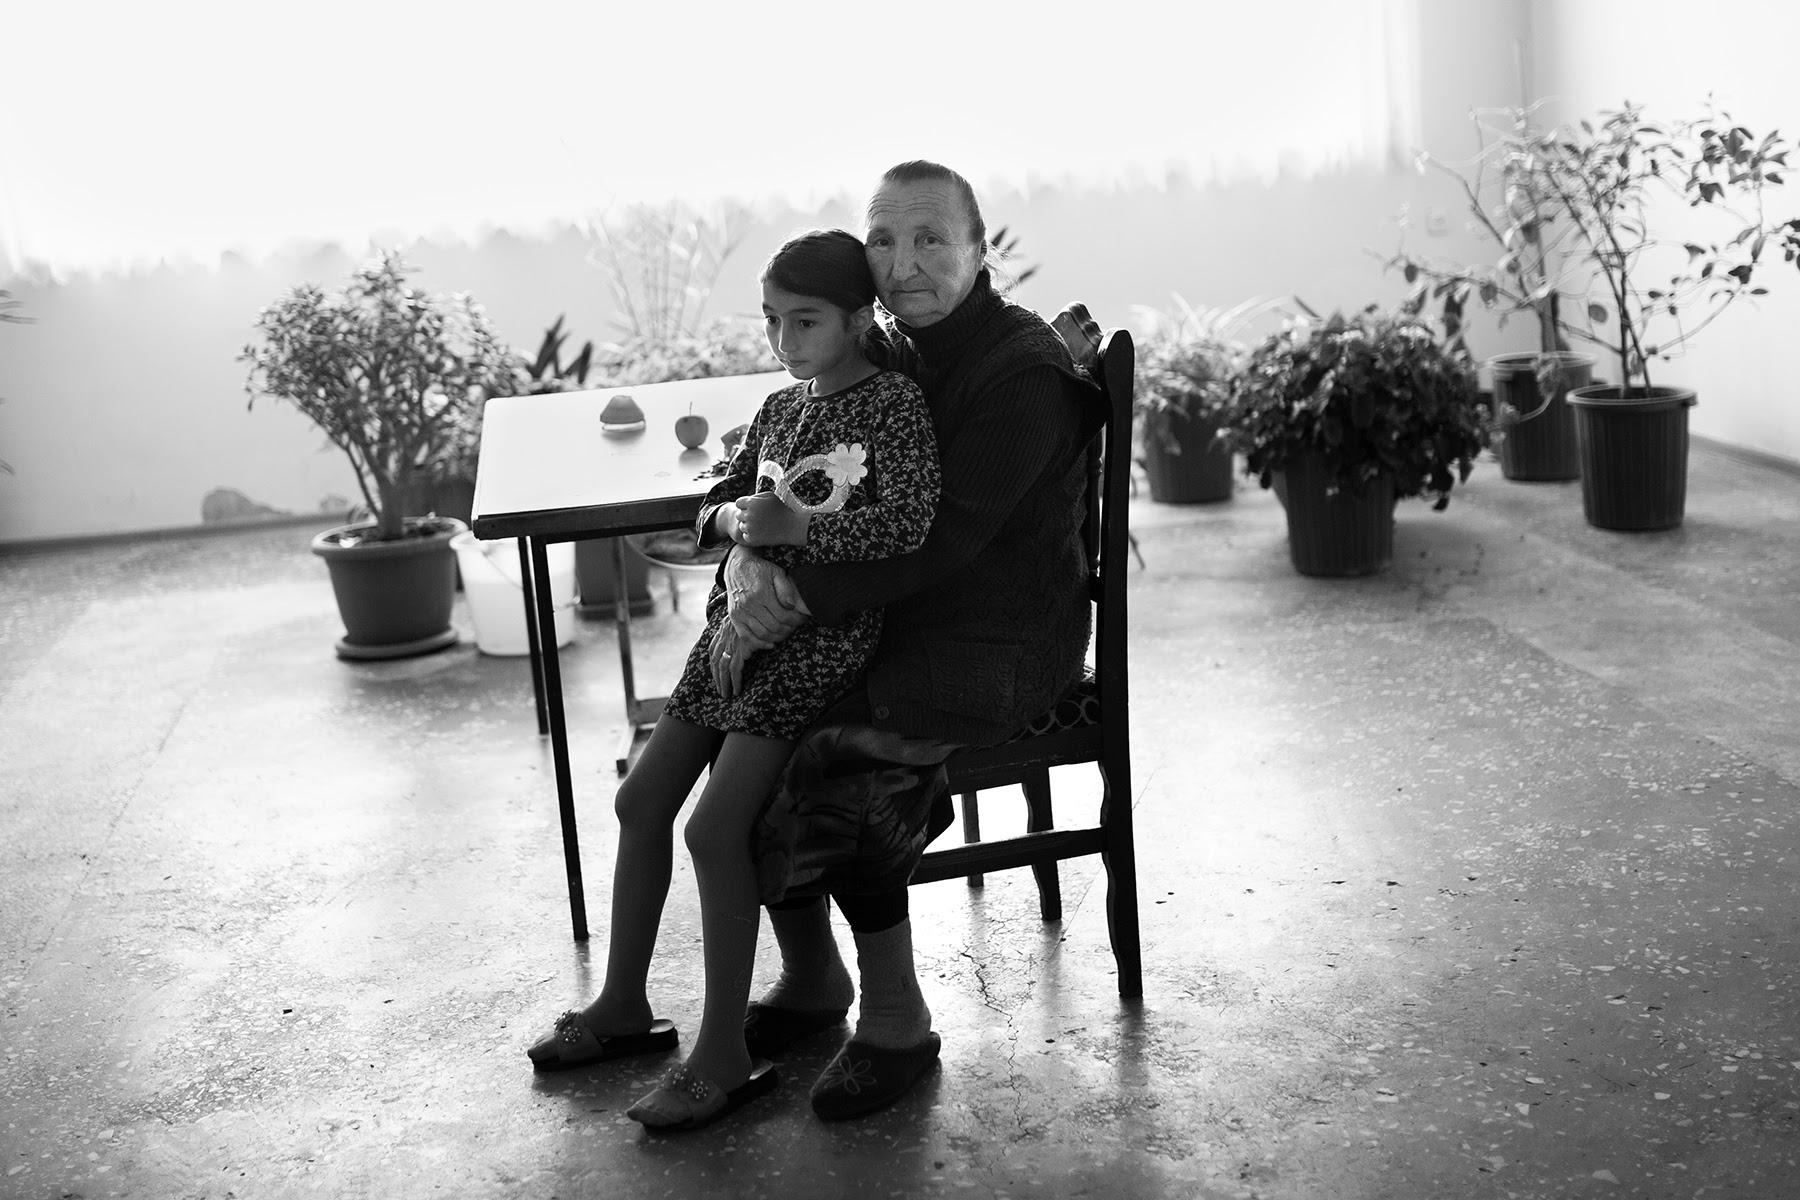 FAR helps family in Artsakh